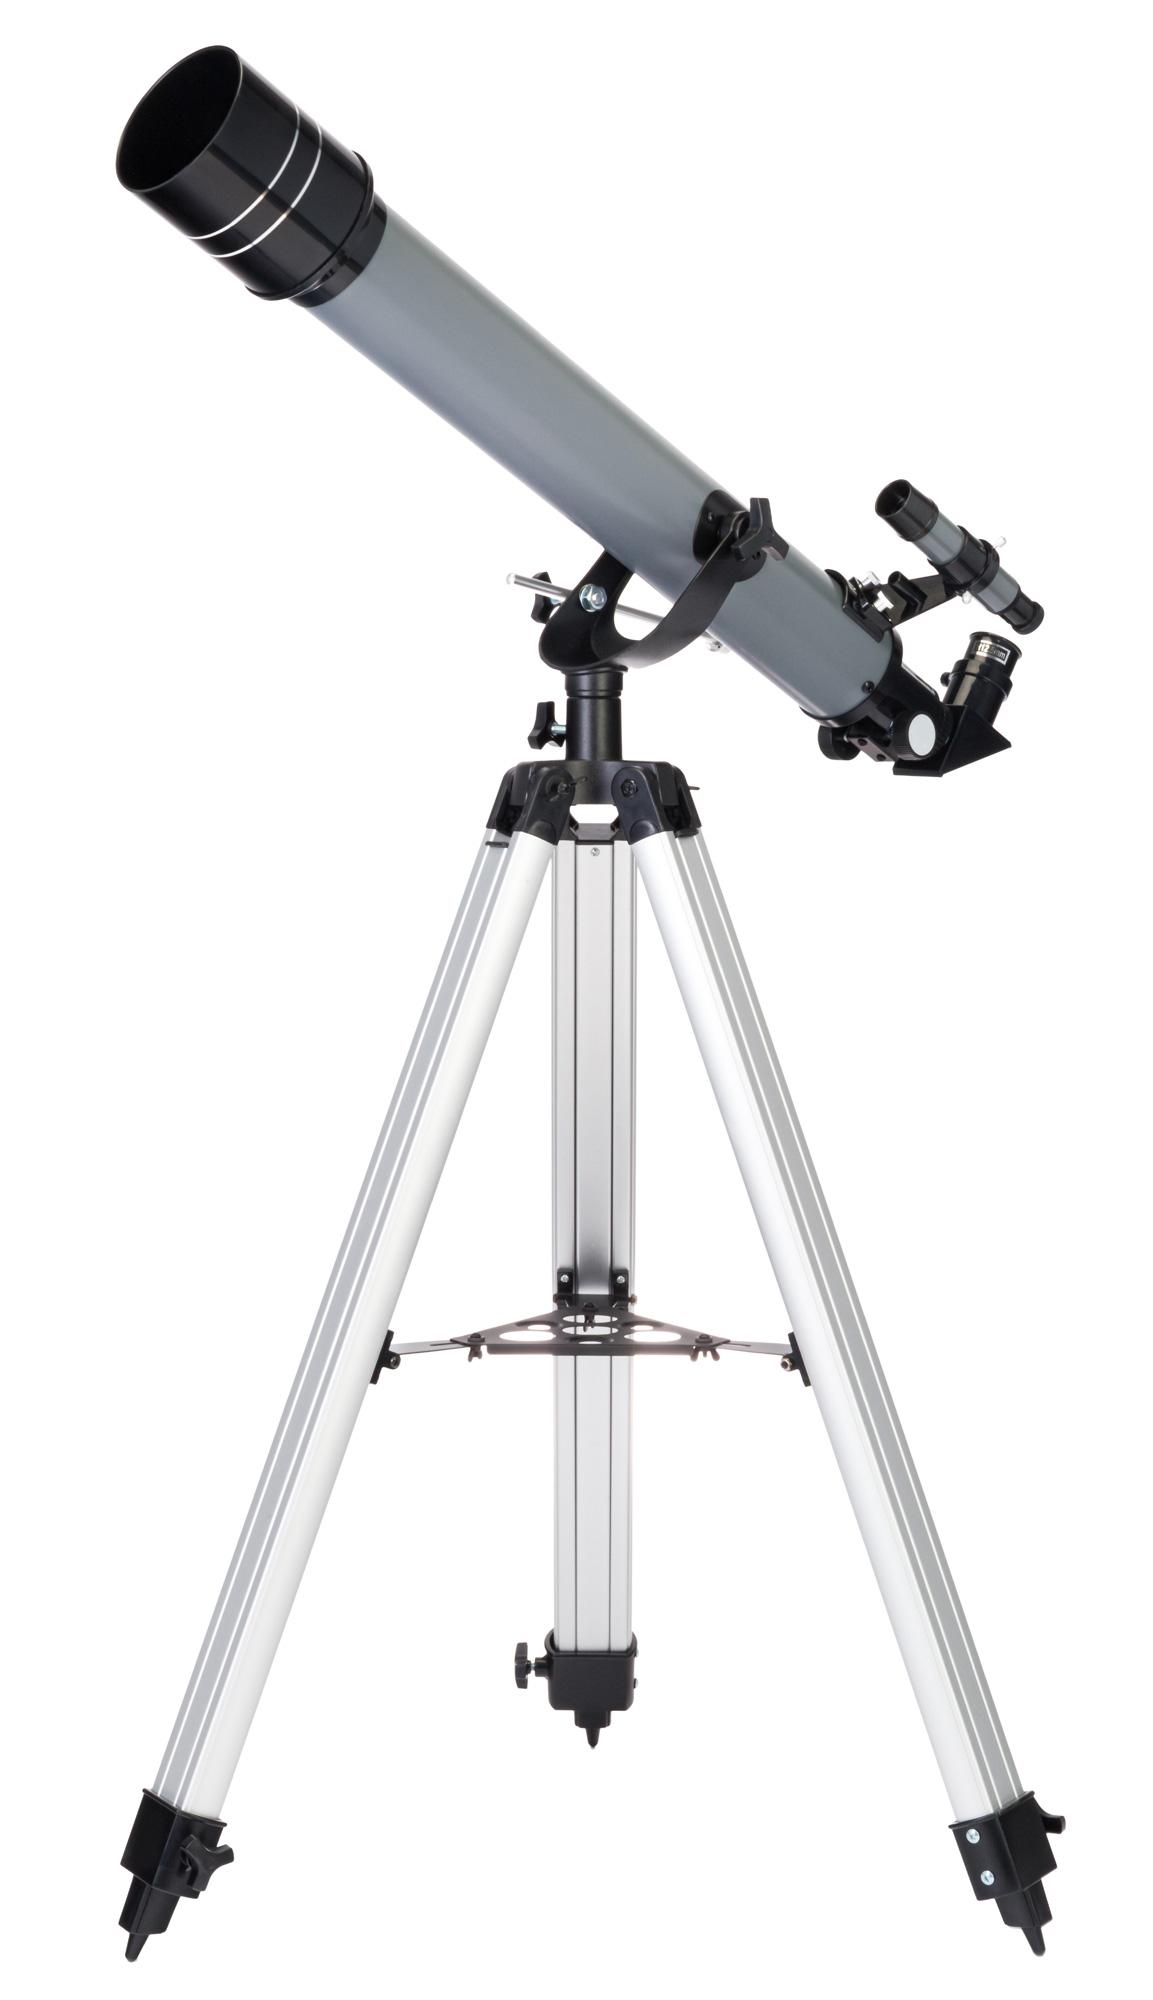 Картинка для Телескоп Levenhuk (Левенгук) Blitz 70 BASE